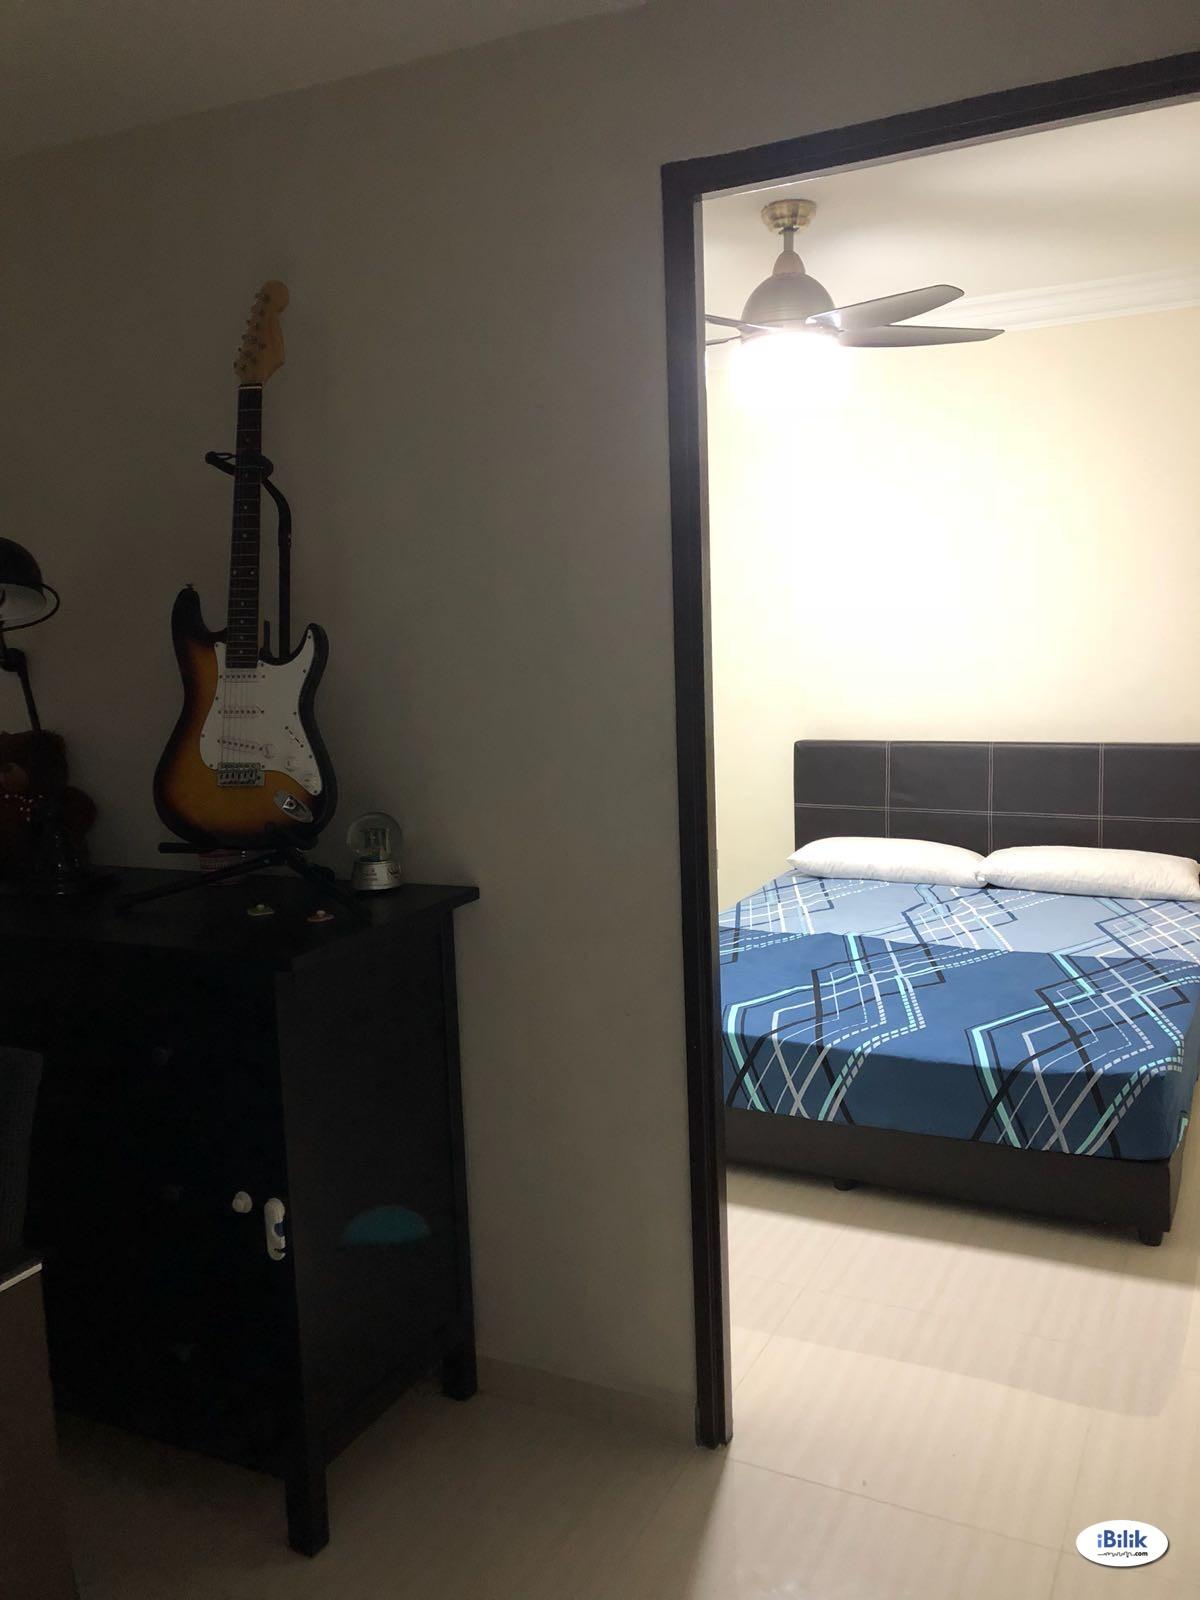 Single Room at Sembawang, Singapore